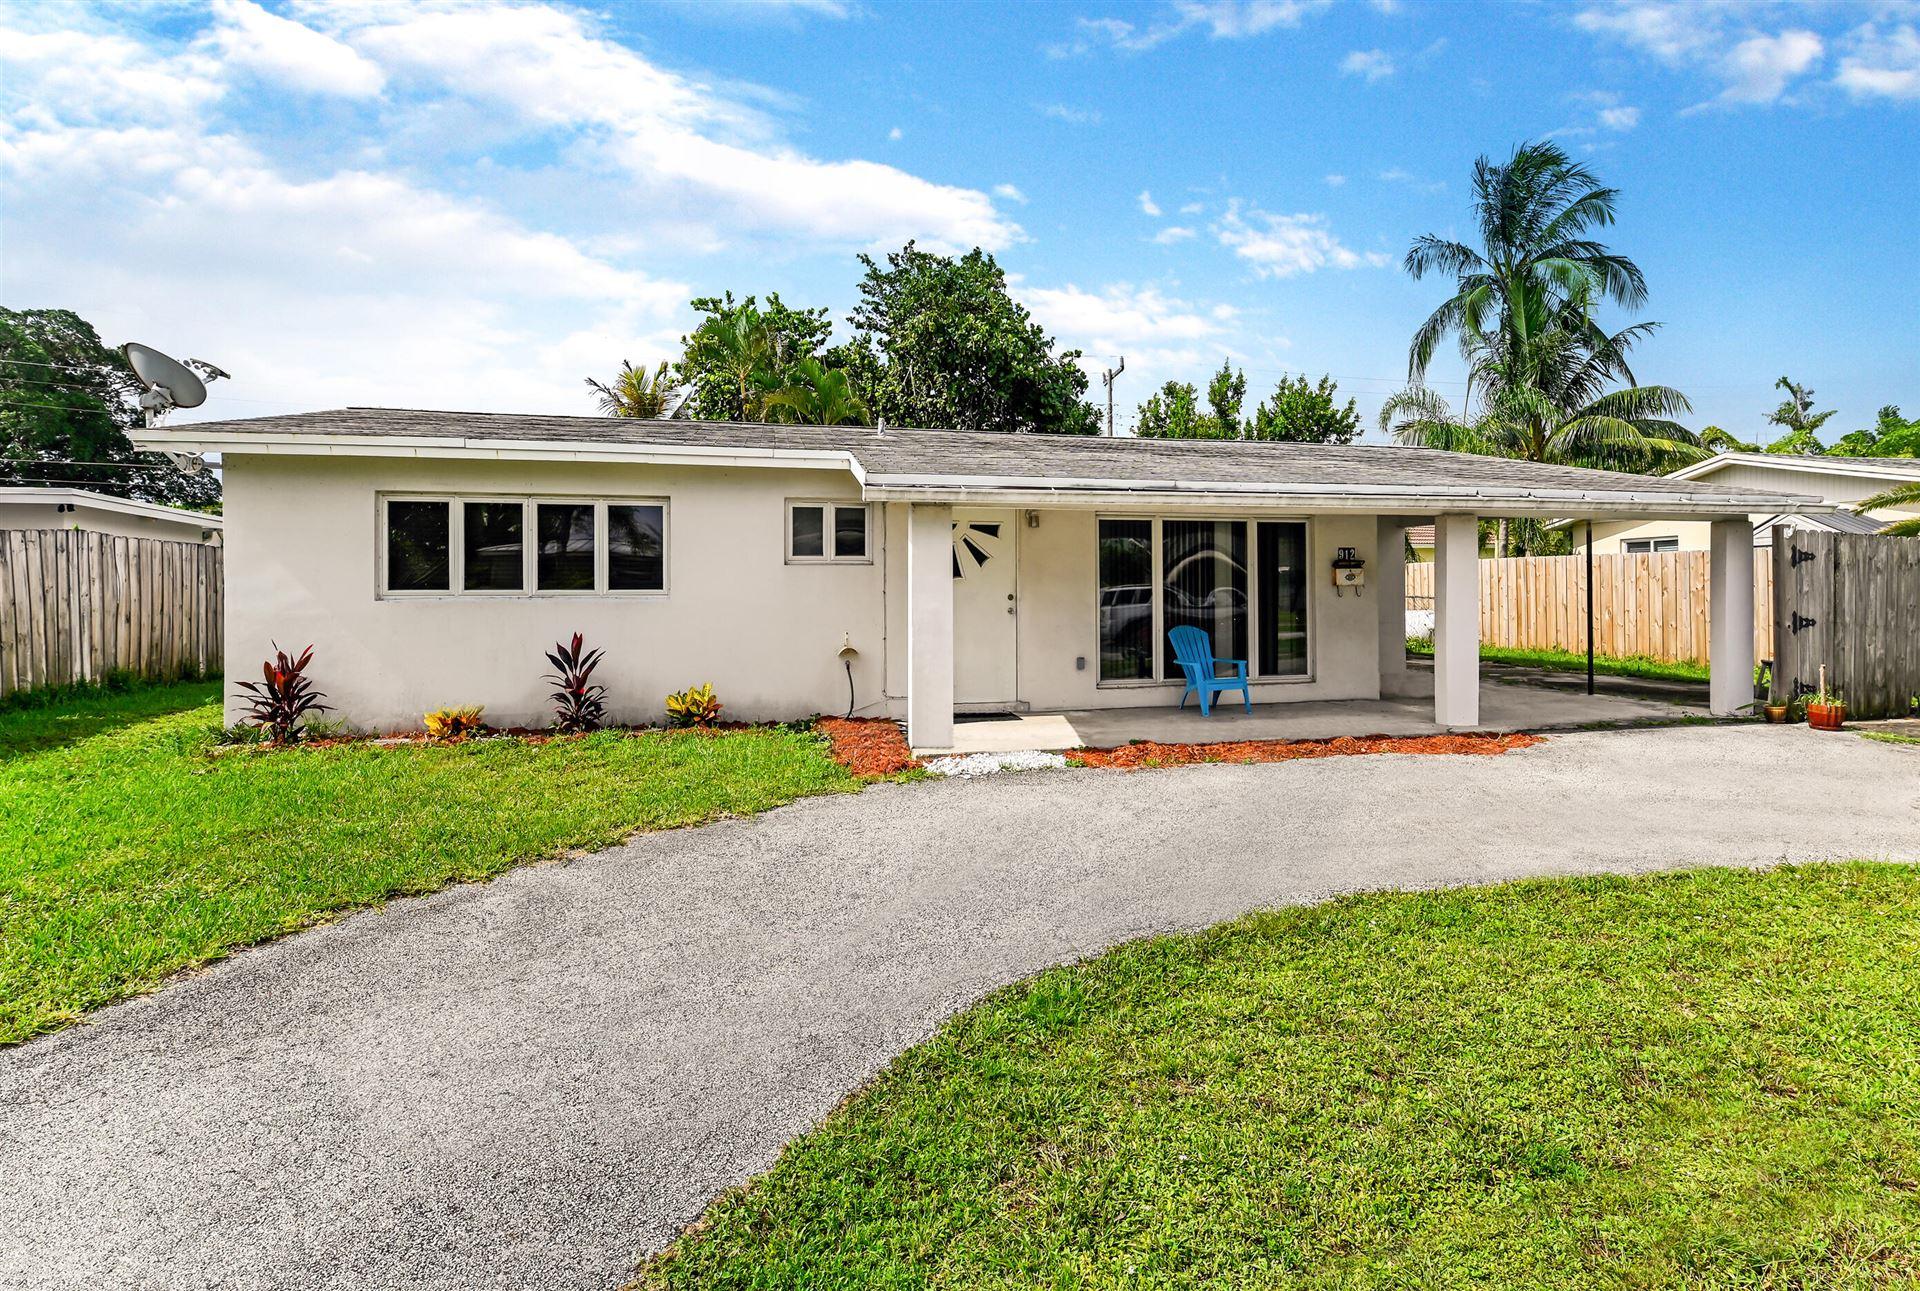 912 SE 13th Street, Deerfield Beach, FL 33441 - #: RX-10733030